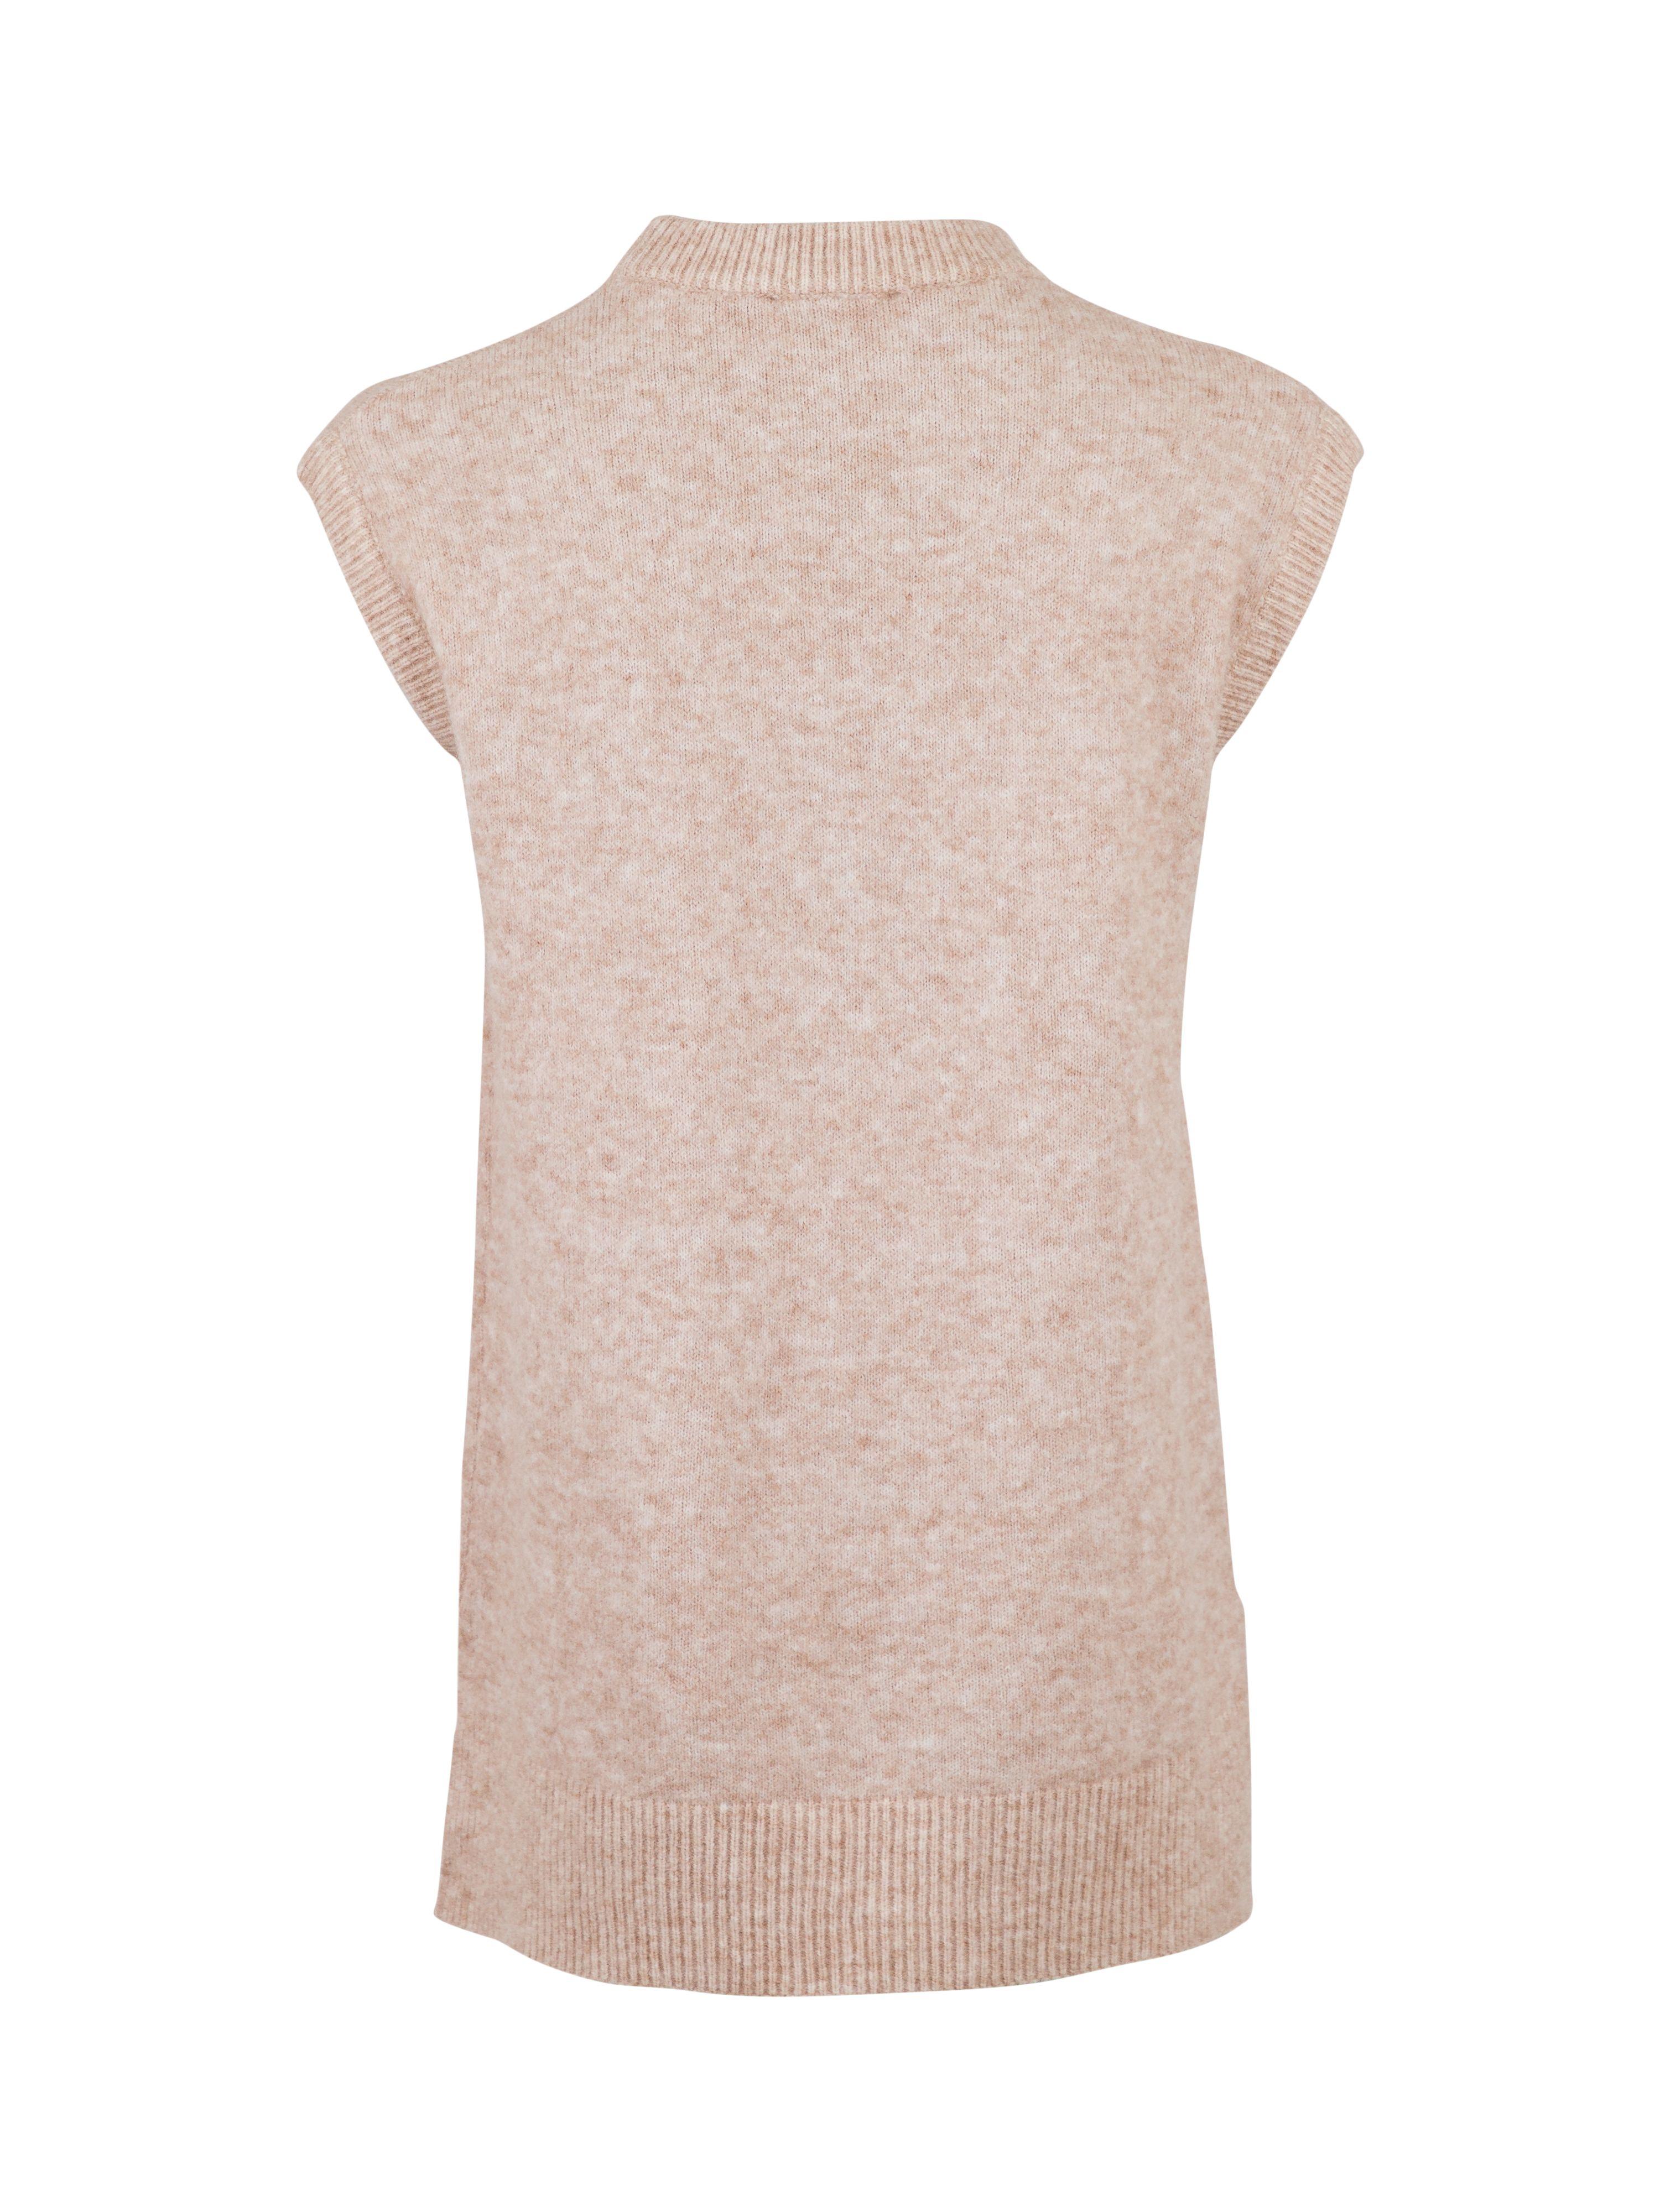 Neo Noir Natascha Knit waistcoat, beige melange, x-small